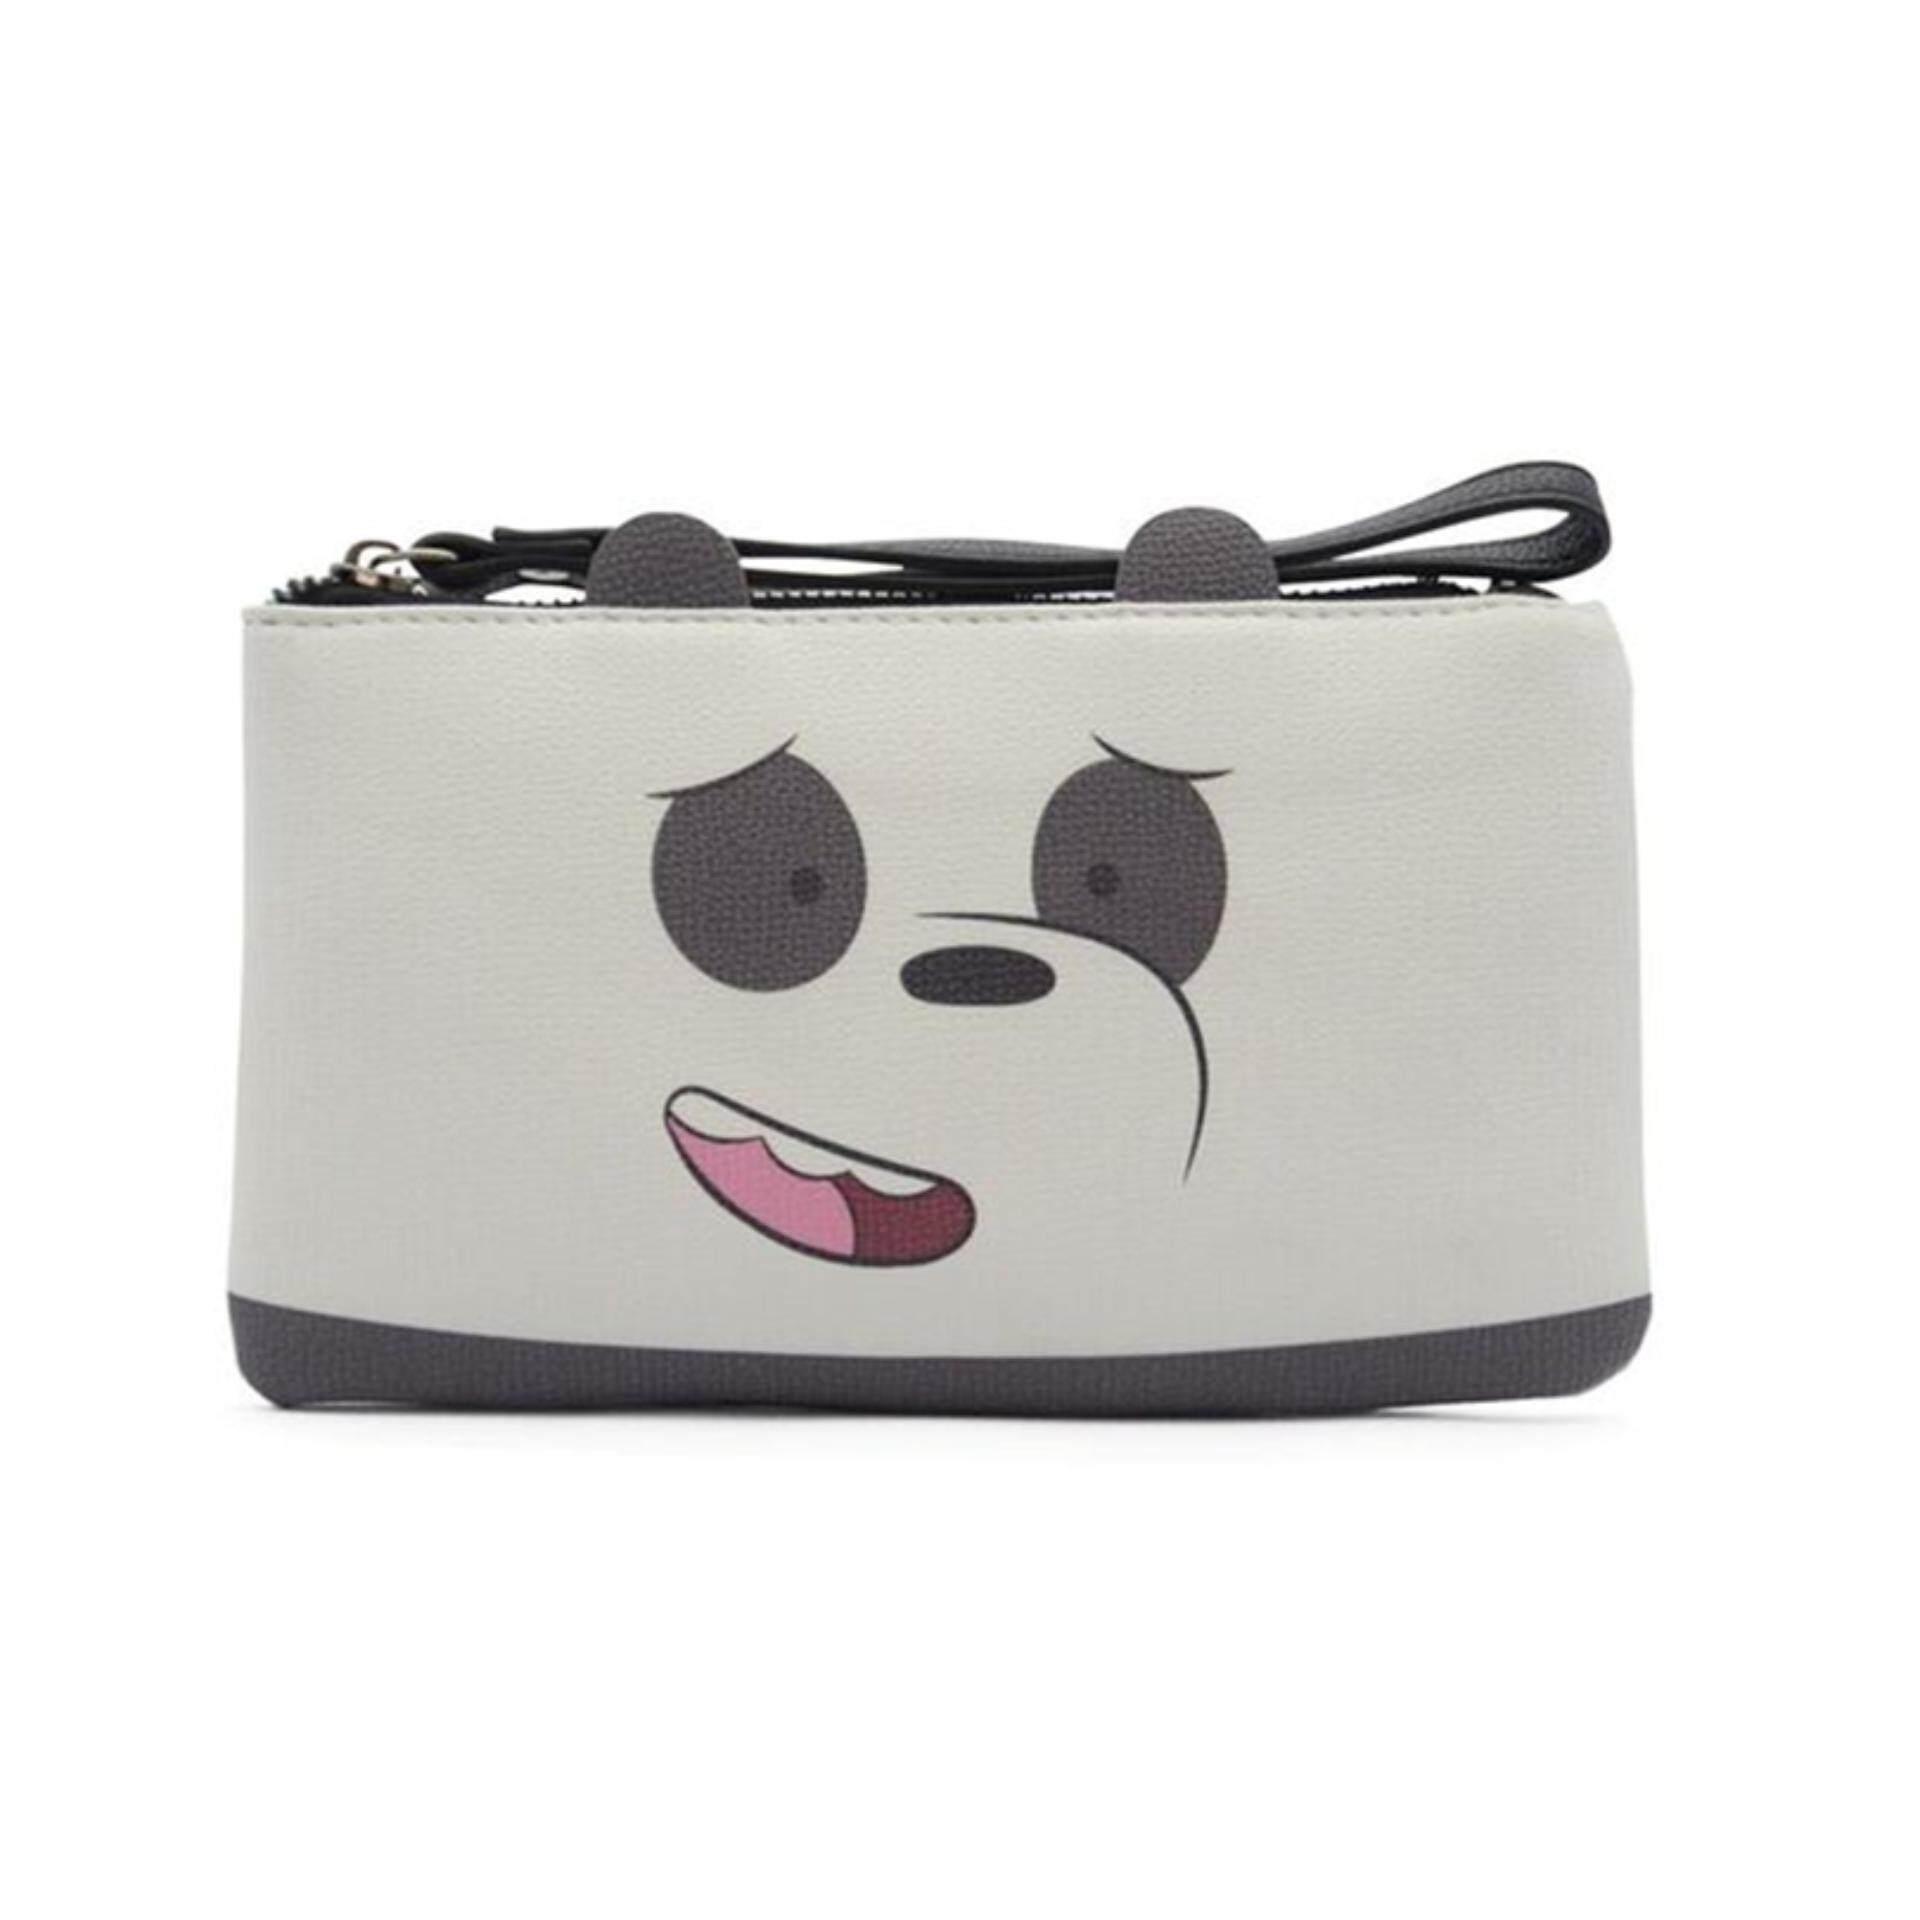 We Bare Bears Wristlet - Panda